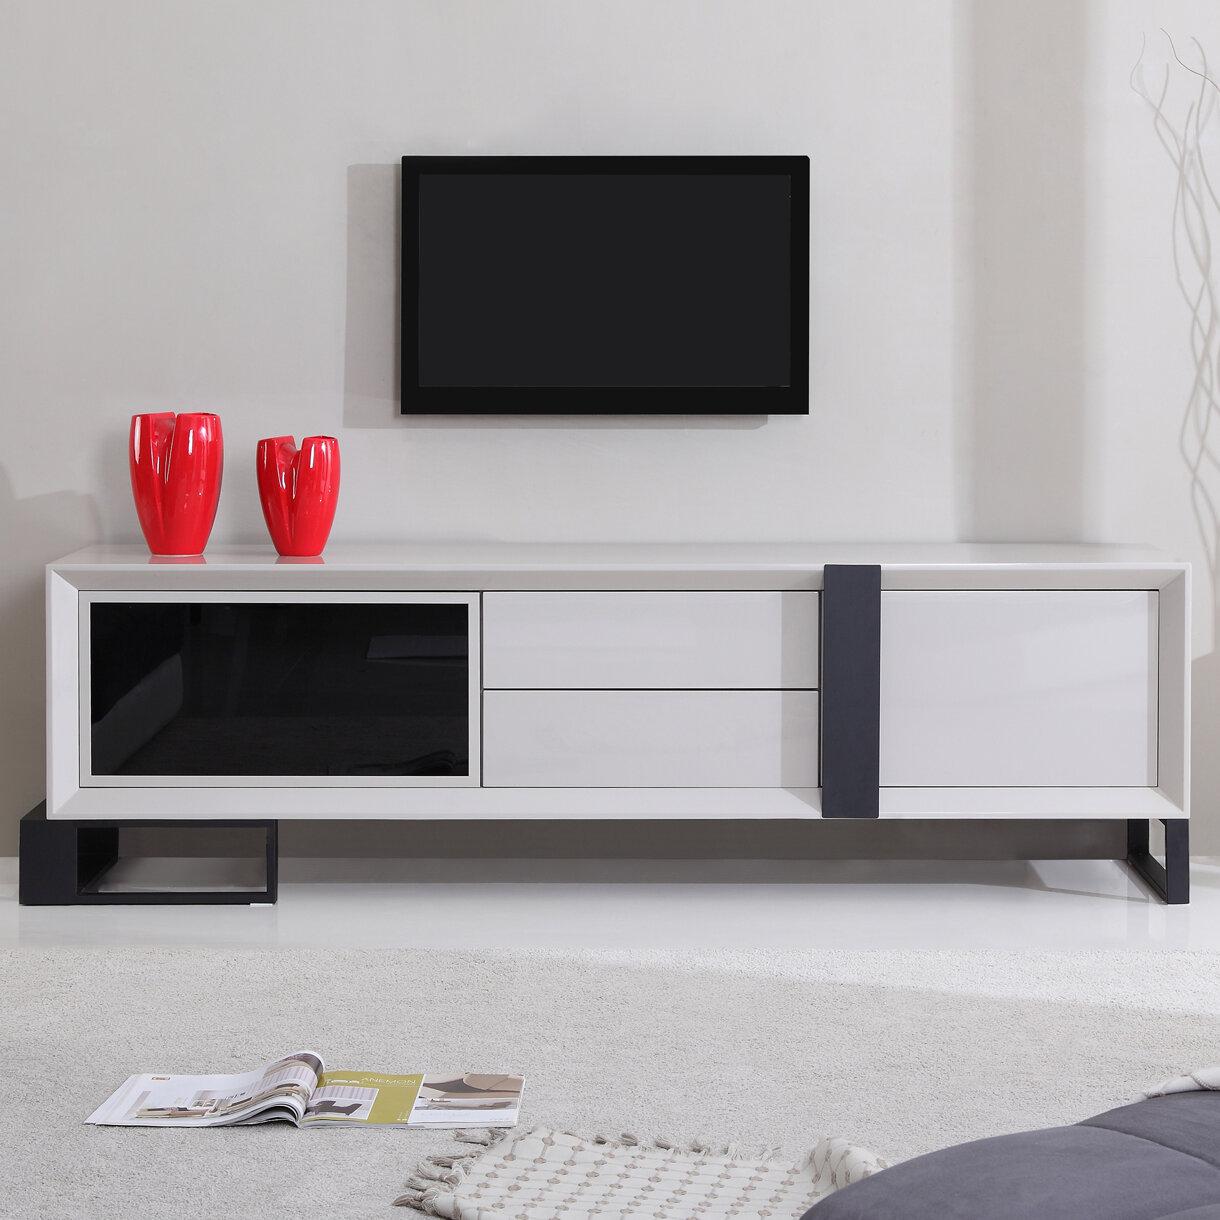 Tv Stand Modern Designs : Contemporary tv cabinet design cabinet design living room cabinet